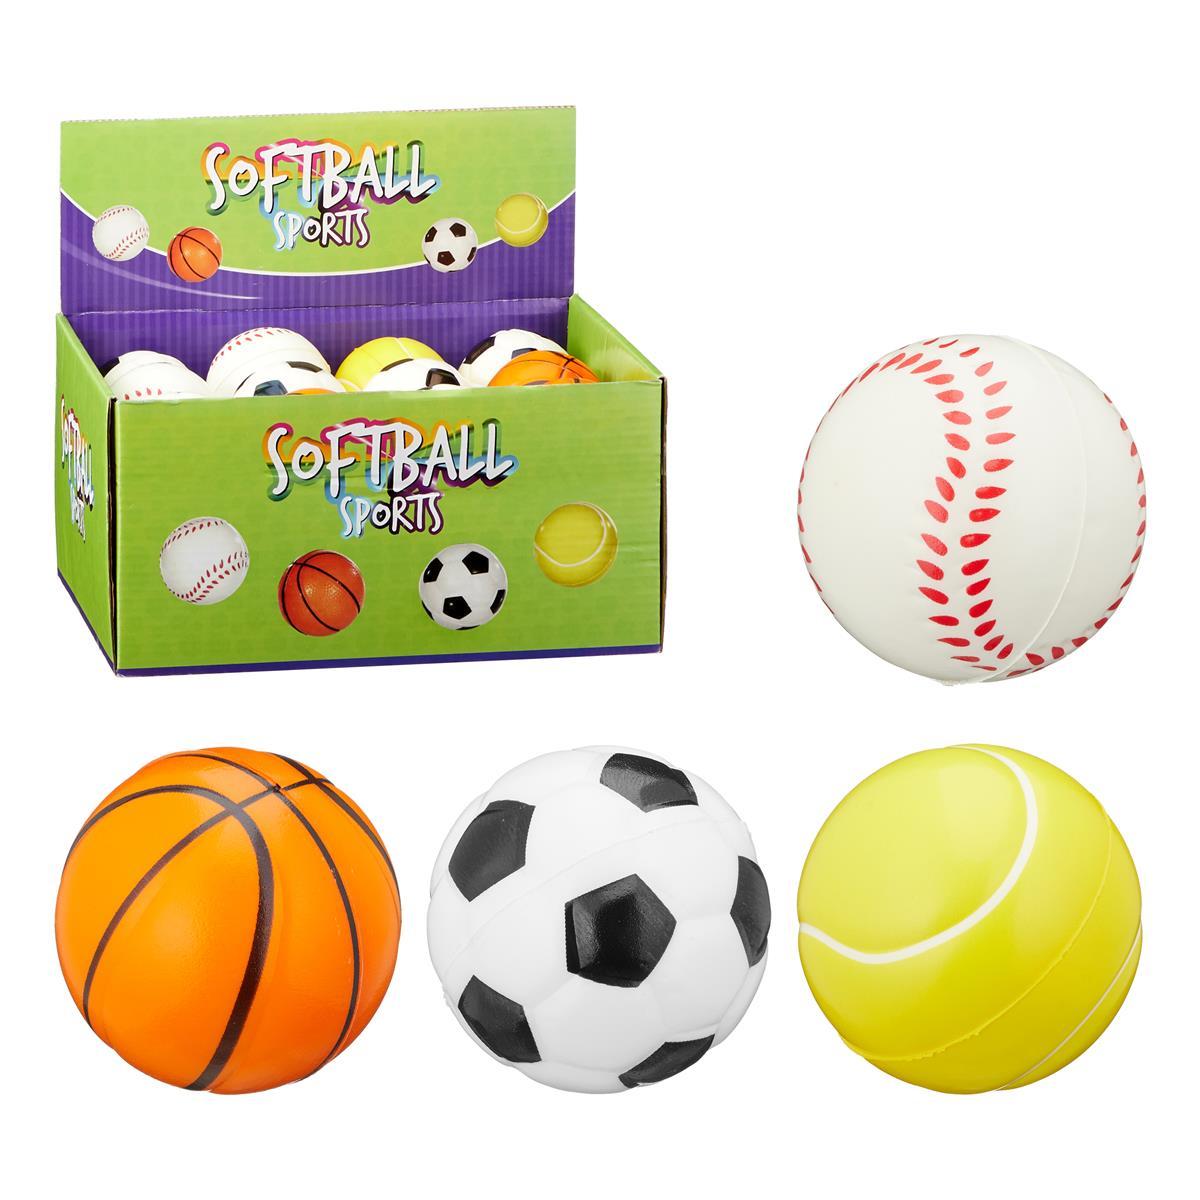 Cepewa 90798 - Softball Sport Fußball